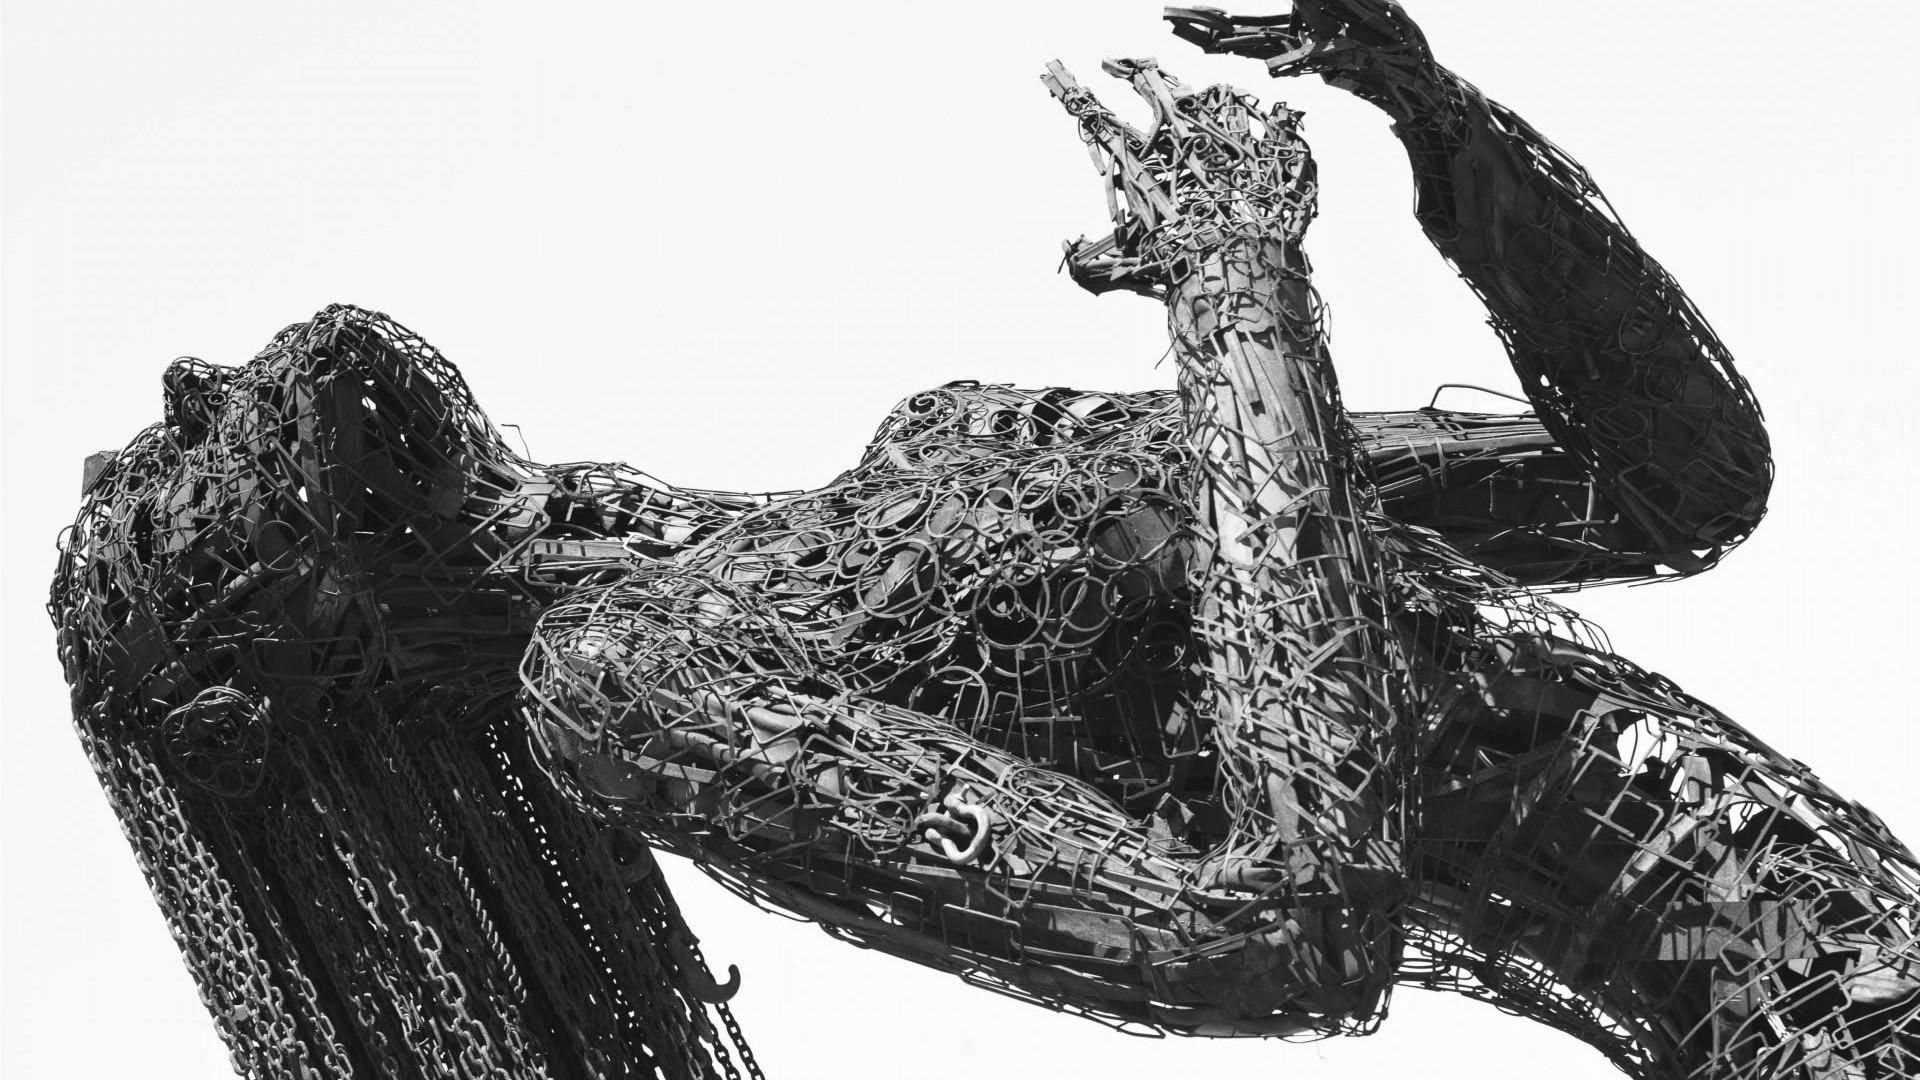 Fond D Ecran Dessin Femmes Monochrome Metal Sculpture